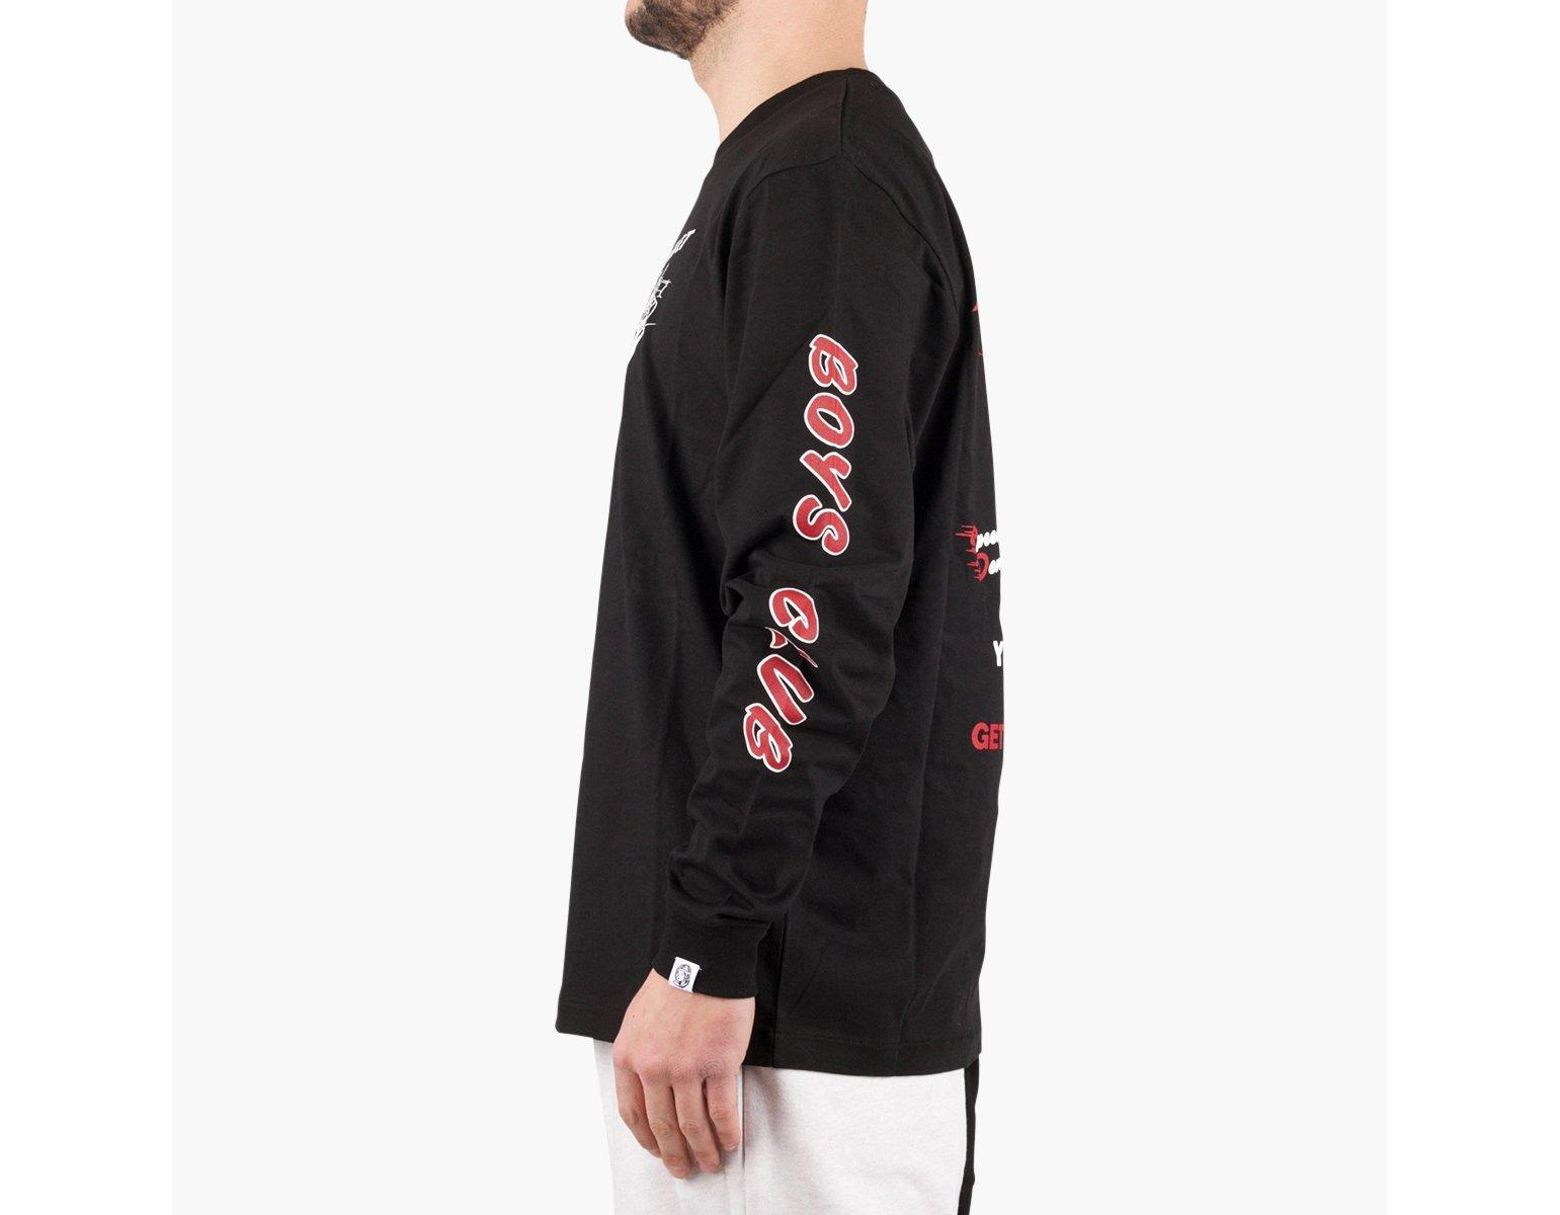 f537282c BBCICECREAM Billionaire Boys Club Rocket Riot Long Sleeve T-shirt in Black  for Men - Lyst